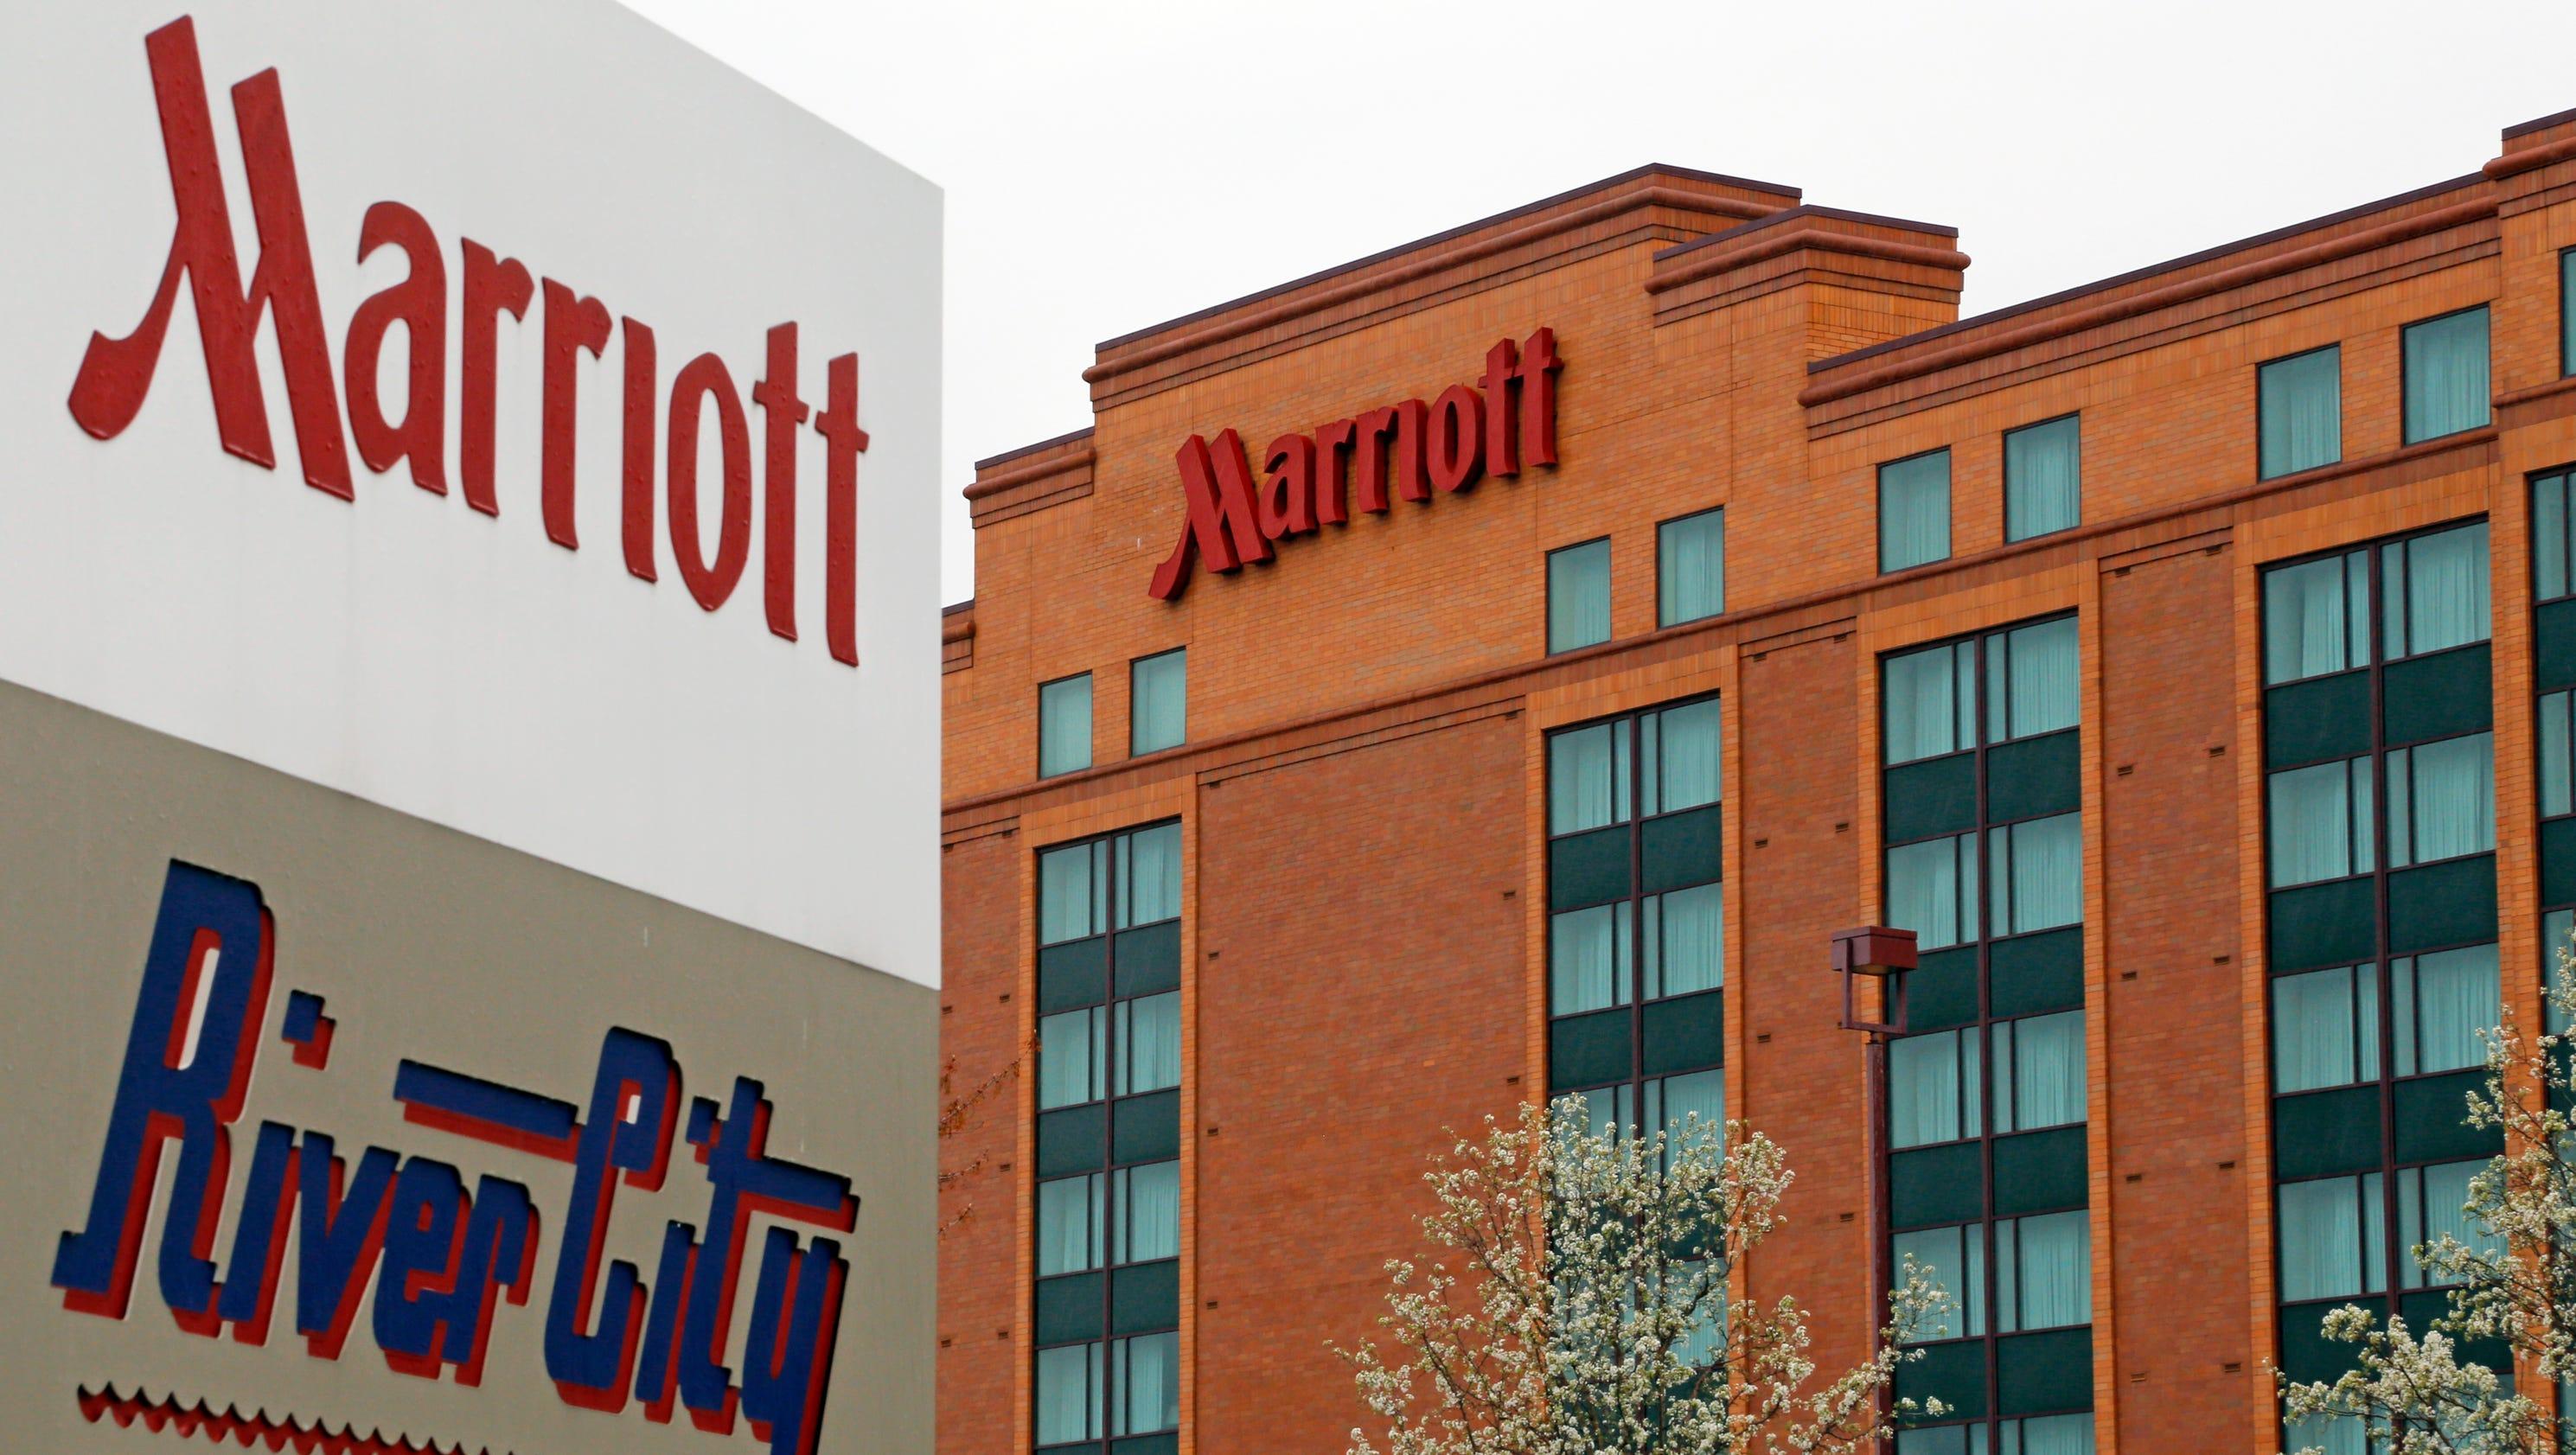 Marriott international to buy starwood hotels for 12 2b for Hotel international